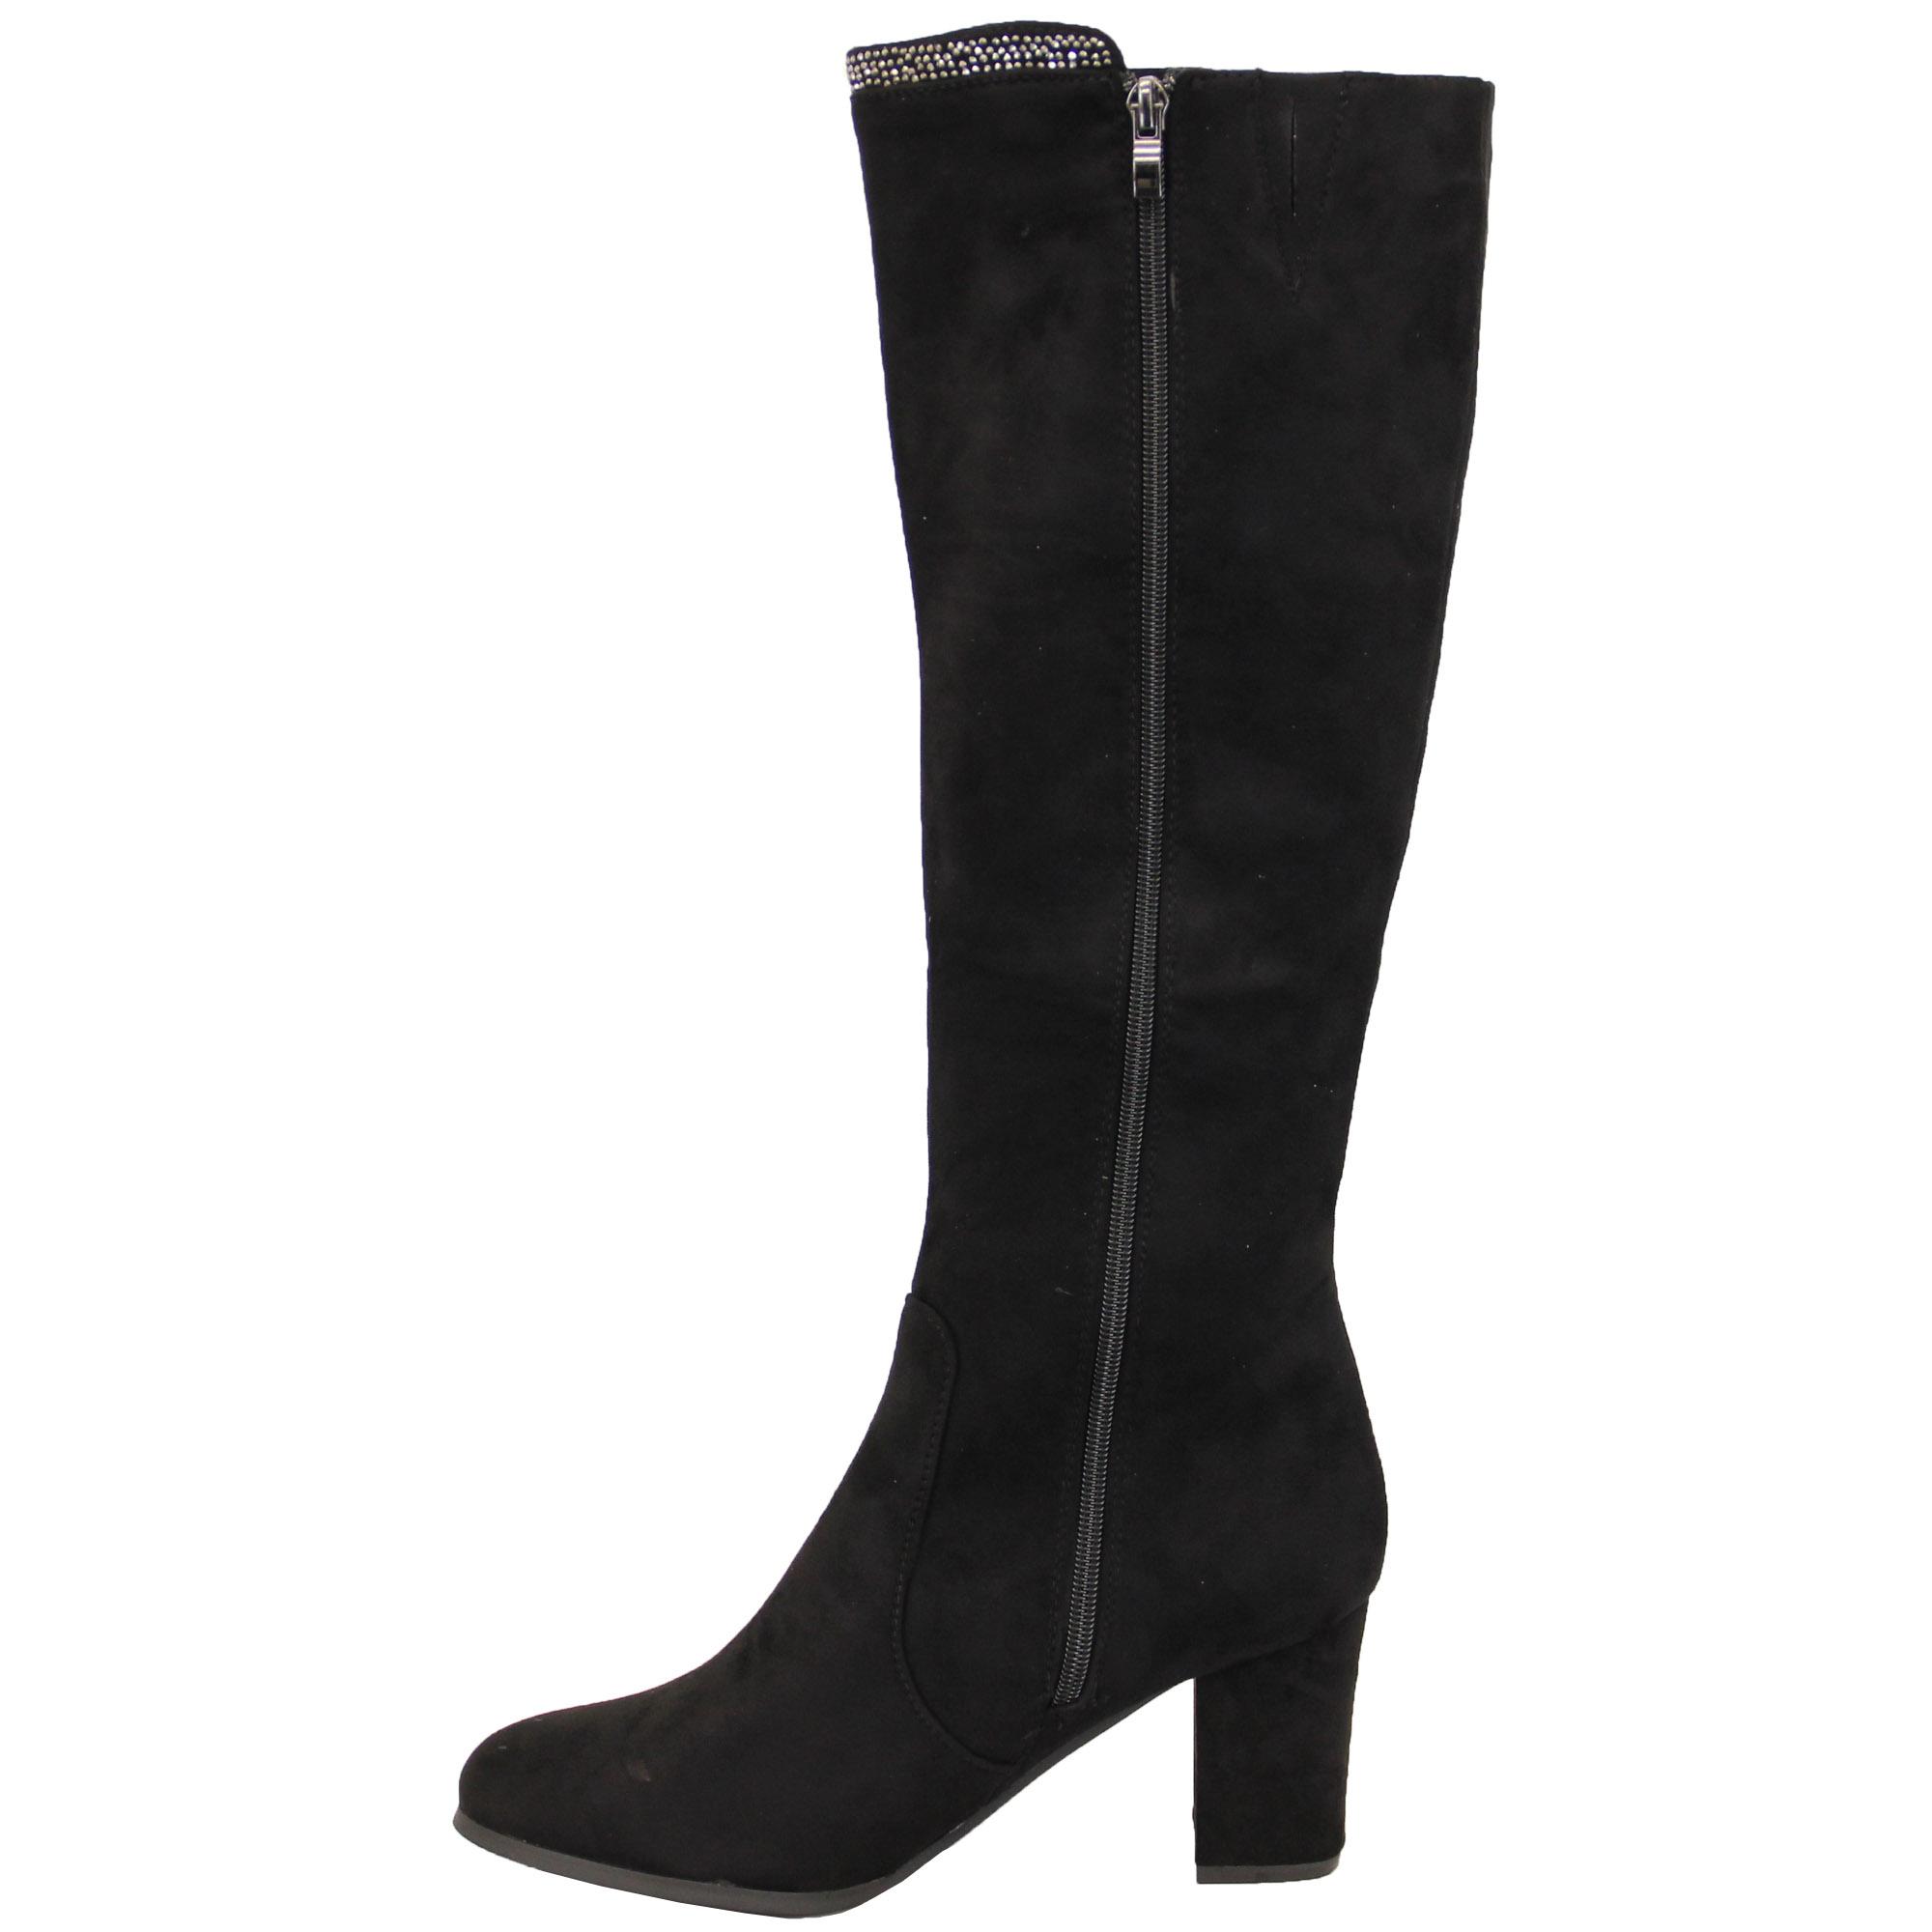 bbaffccd20449 Ladies Suede Look Boots Long Knee Calf Shoes Womens Block Heel Fur ...